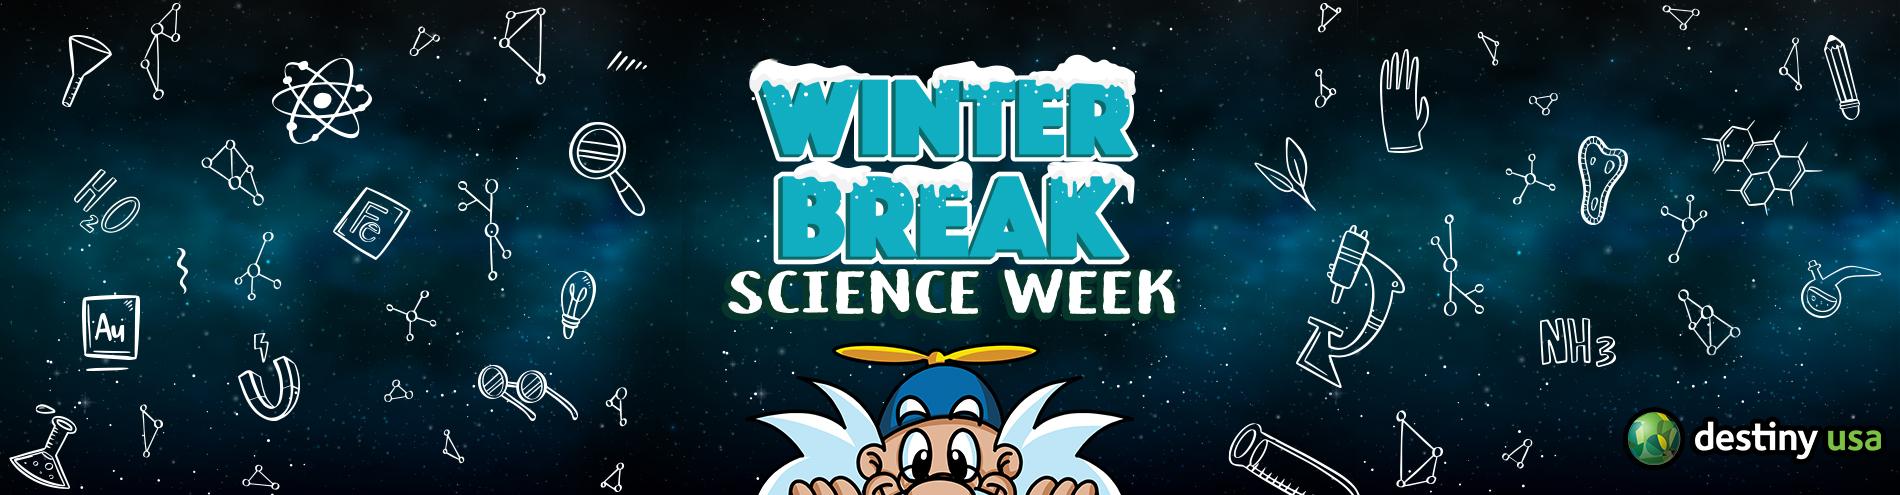 20200107 Science Week 1900 x 495 Slider Revolution